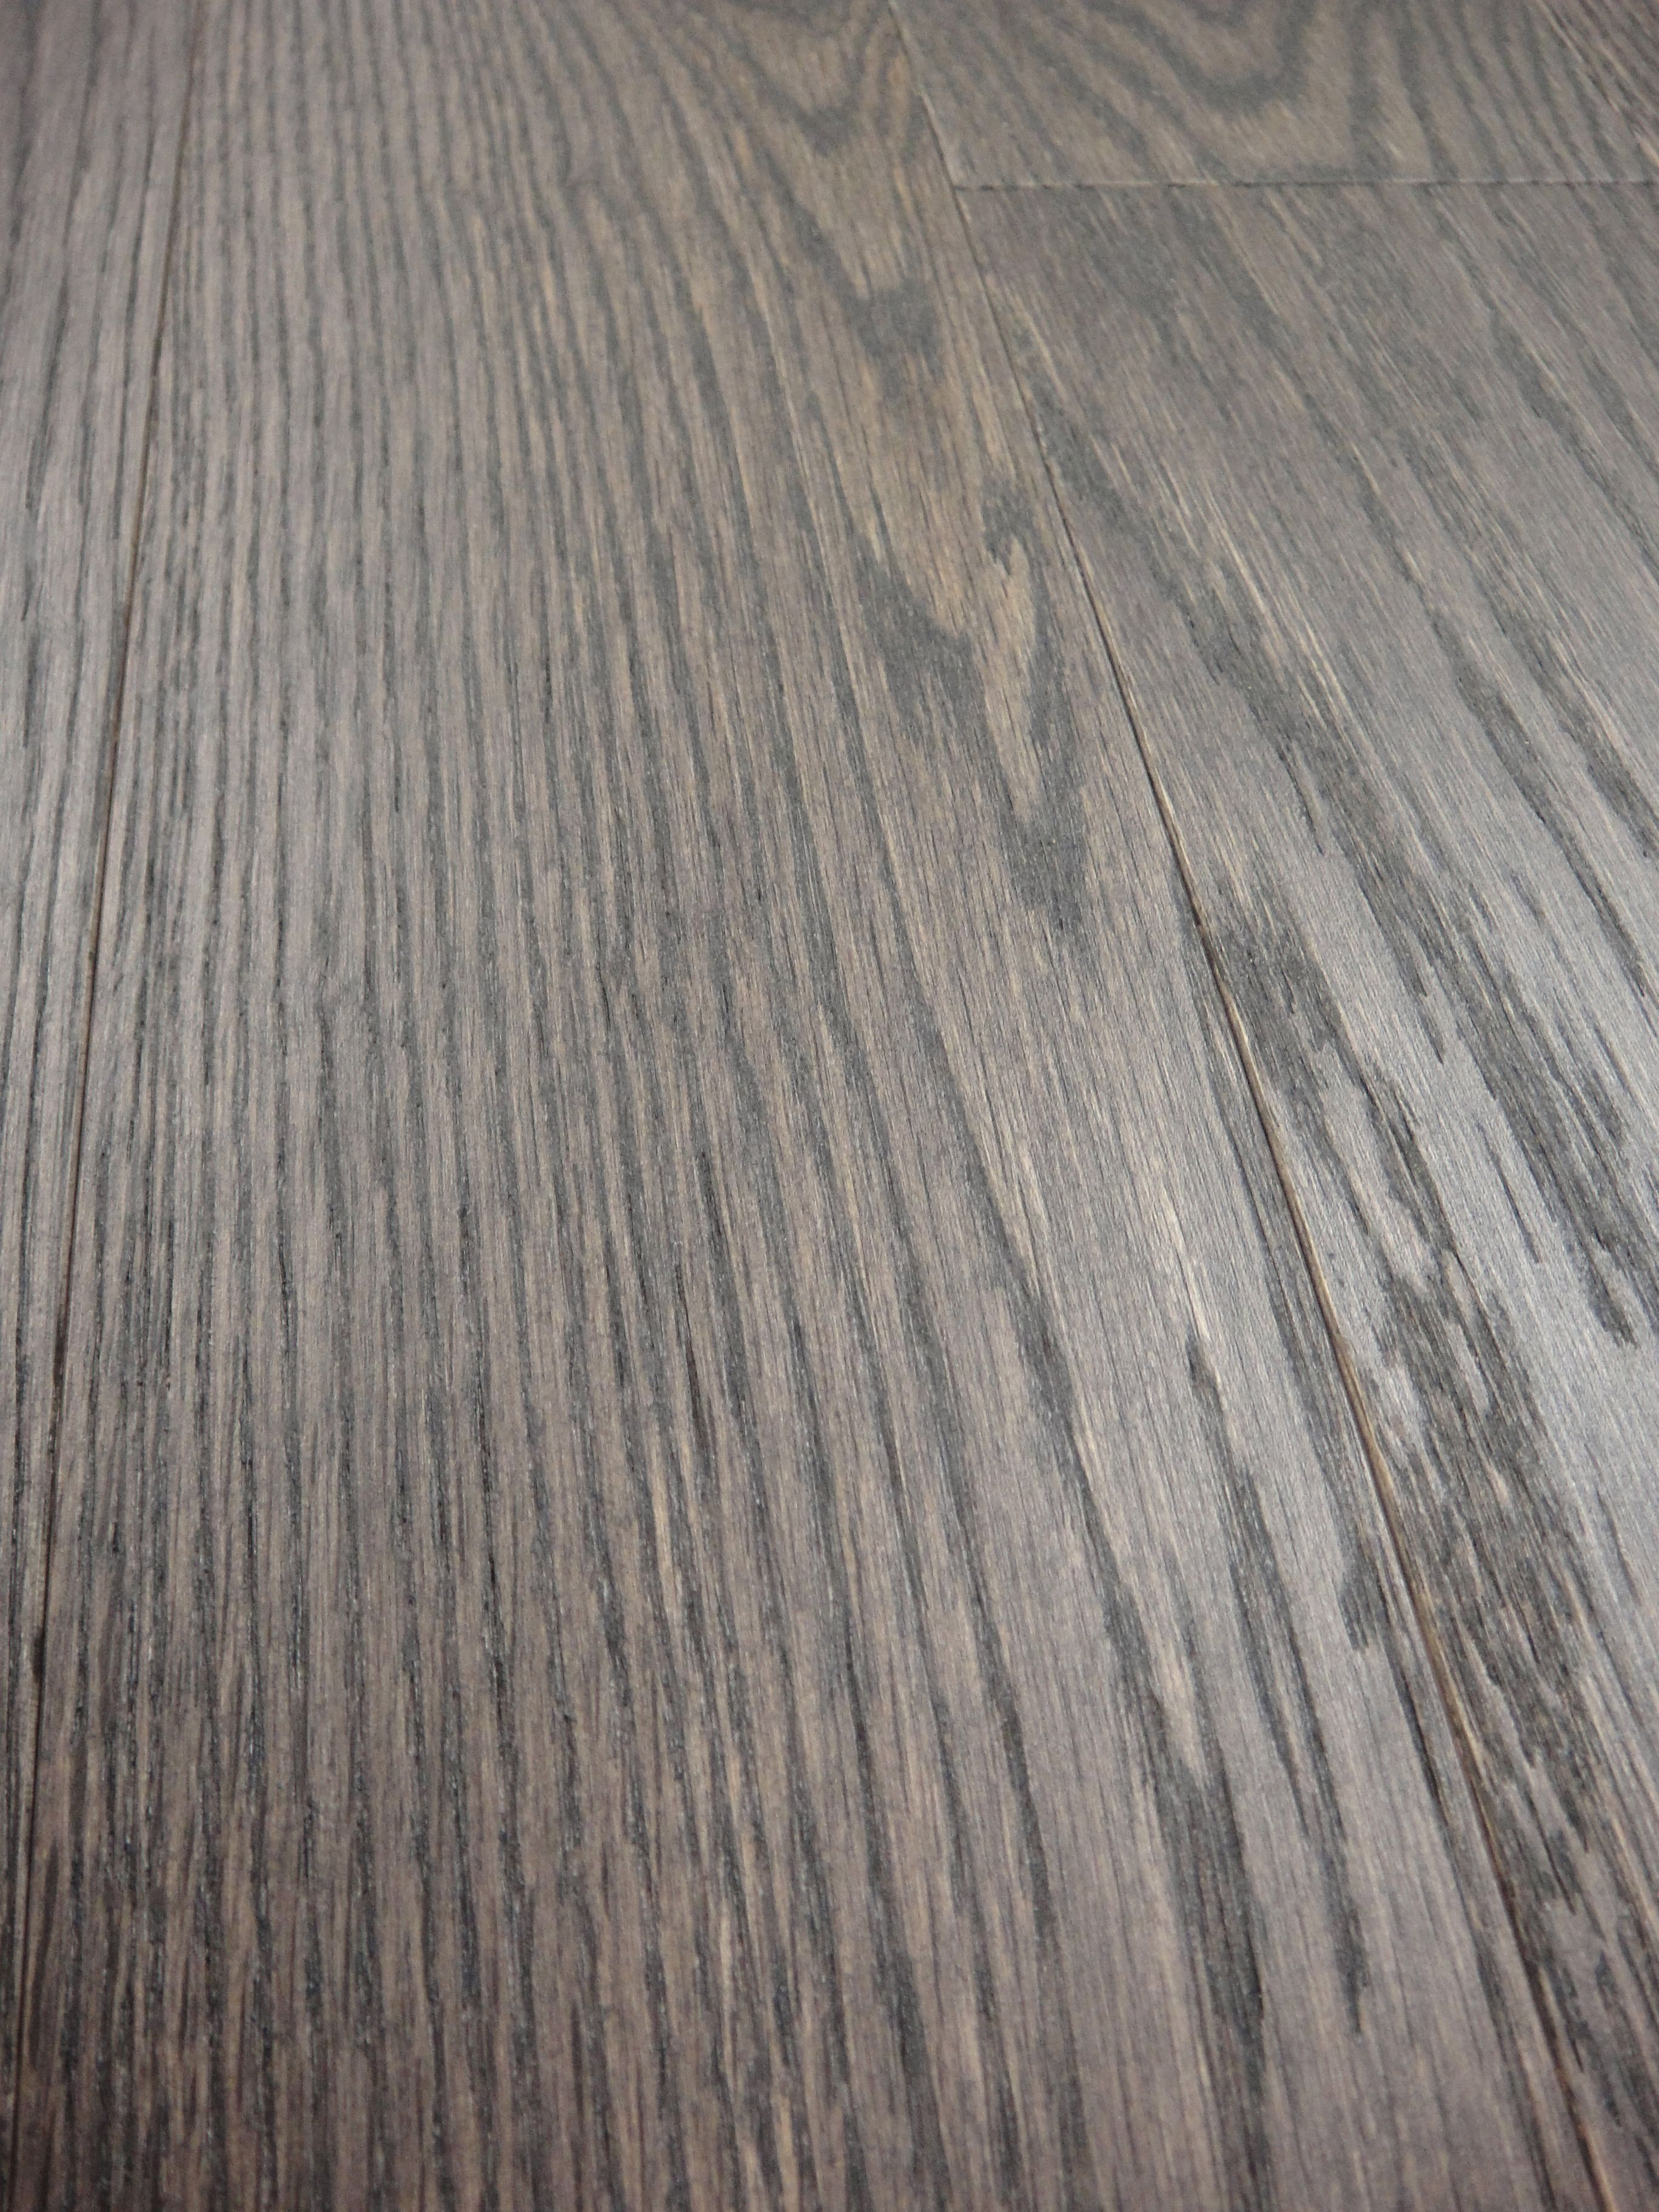 Vintage Hardwood Flooring Red Oak Heritage Wire Brushed